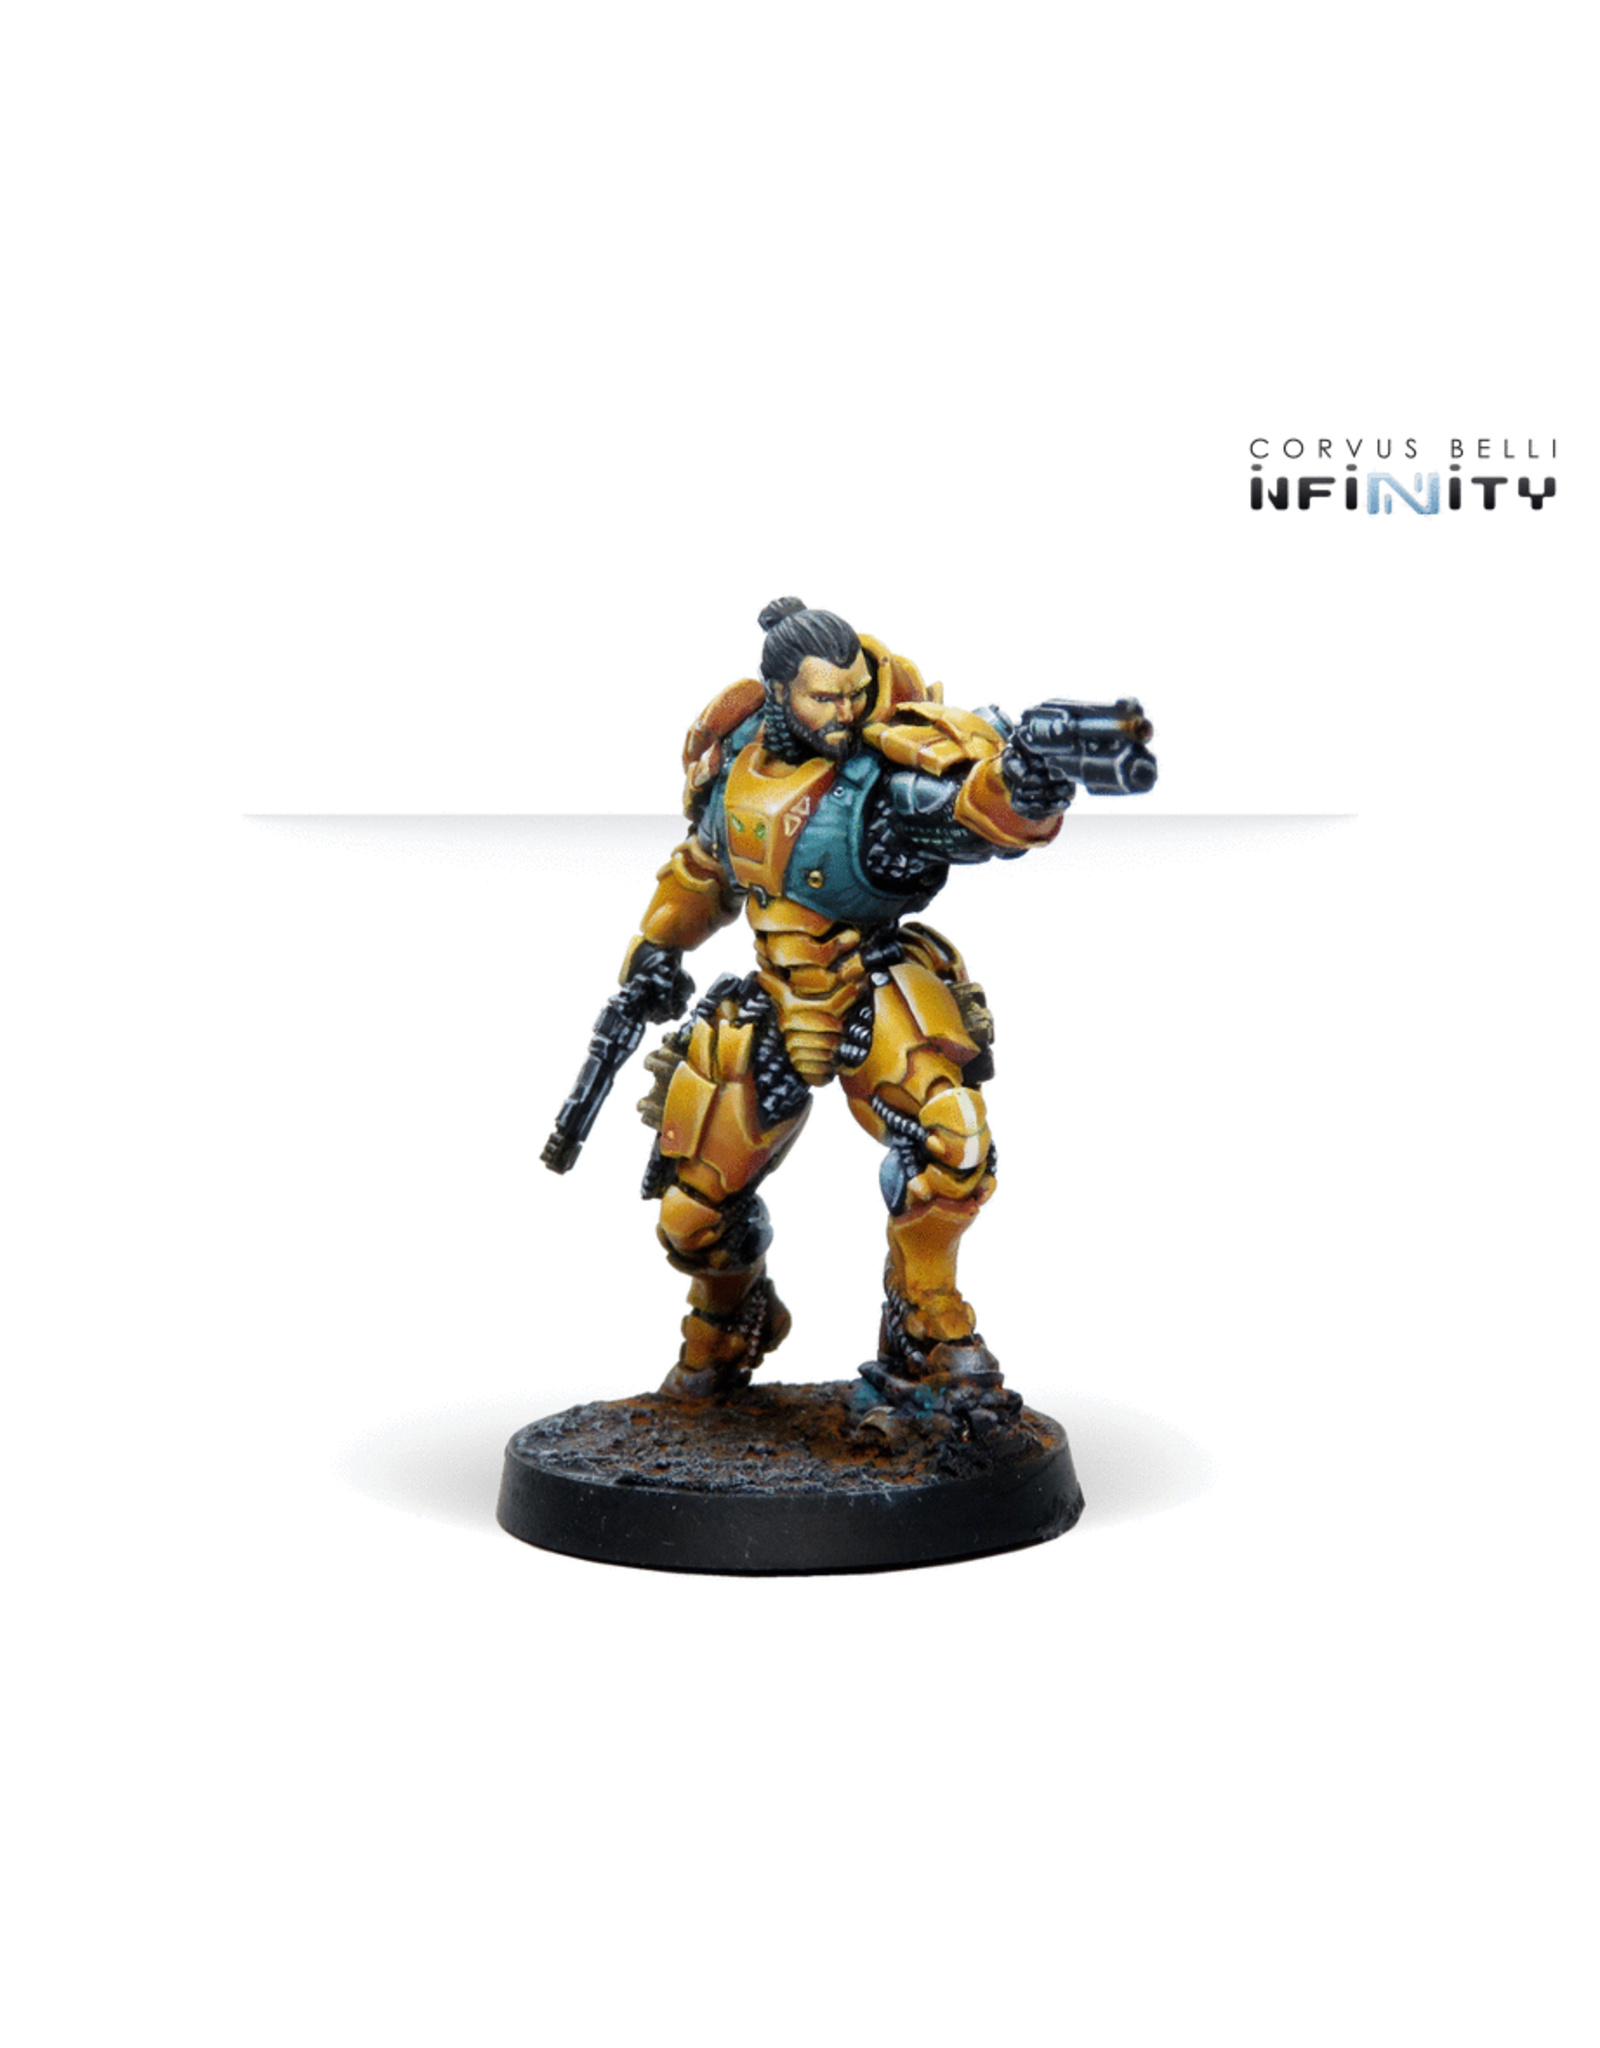 Corvus Belli Infinity: Krit Kokram, Invincible Zuyongs Specialist